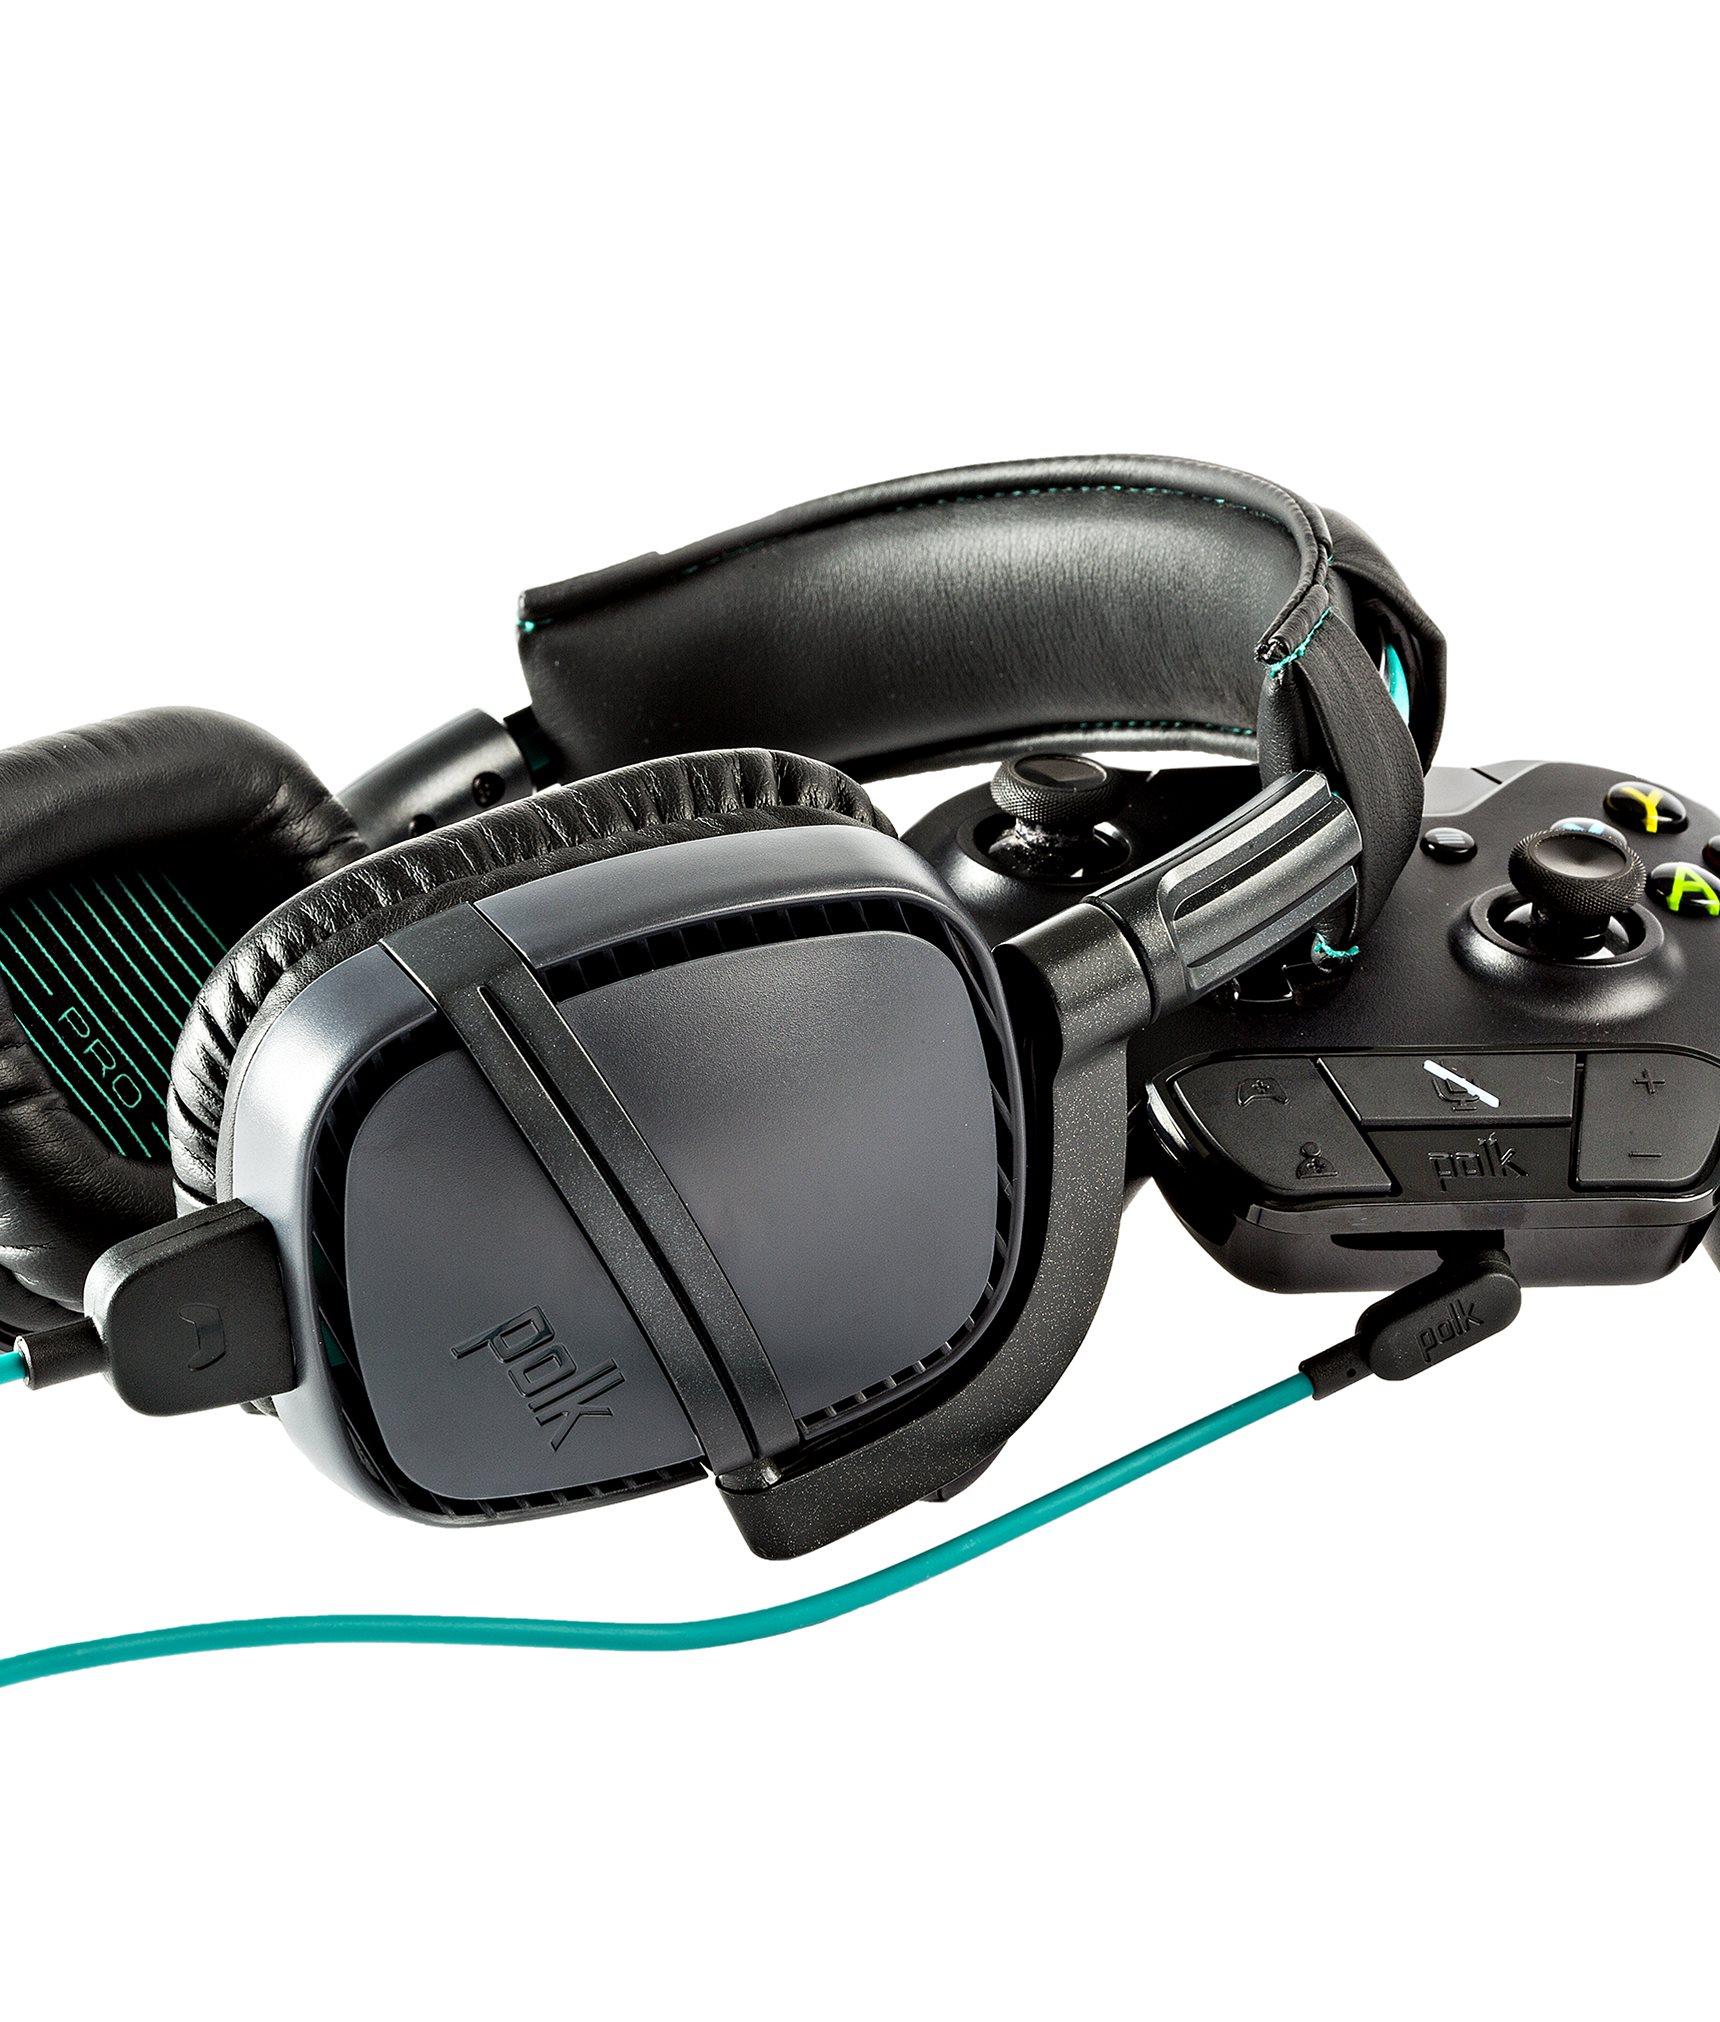 featured-polk-audio-striker-pro-gaming-headset